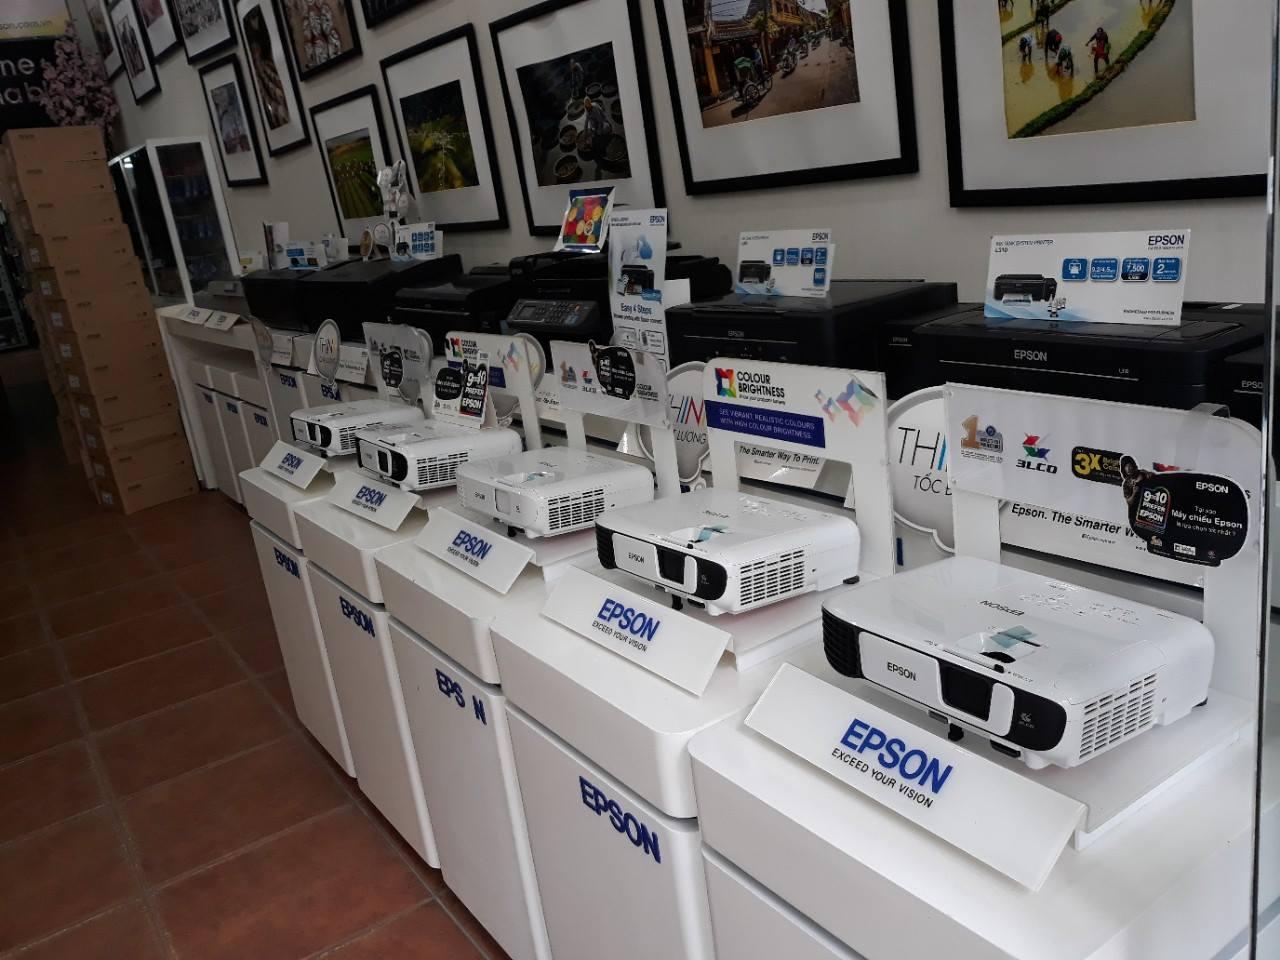 mua máy chiếu epson tại hcm